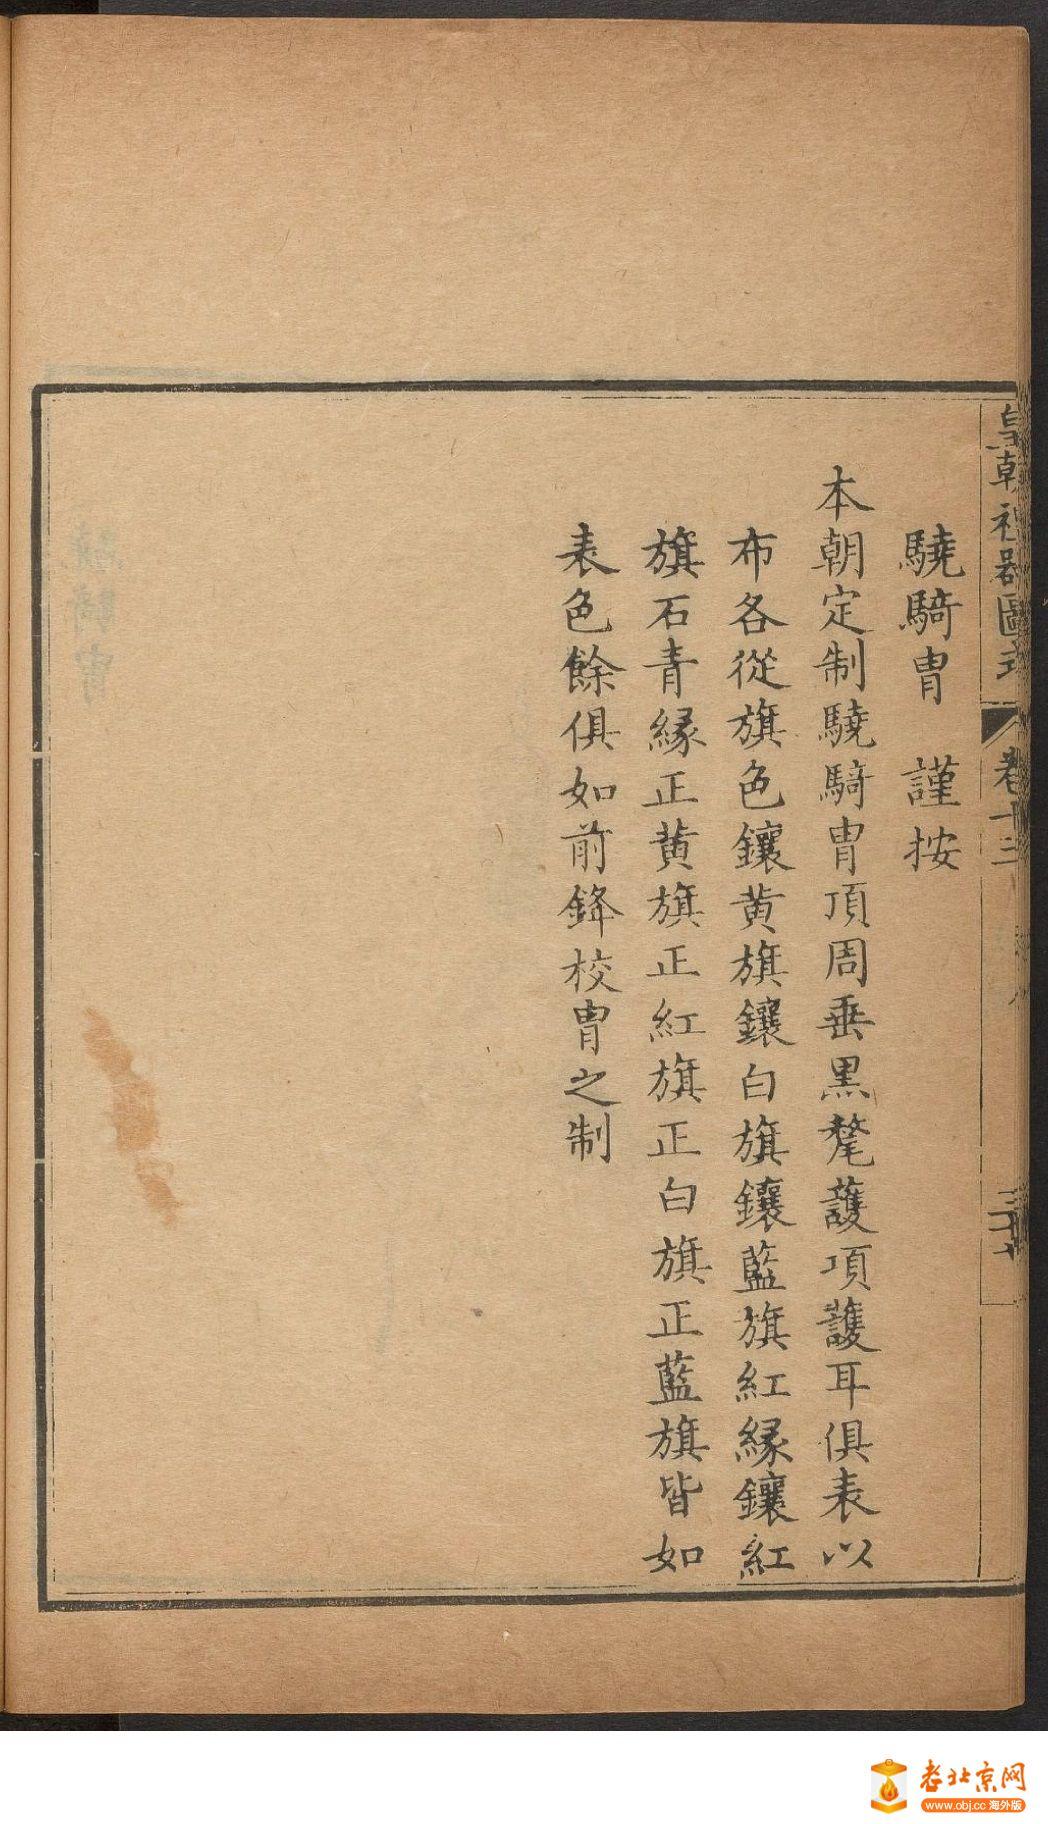 4_page8_image1b.jpg